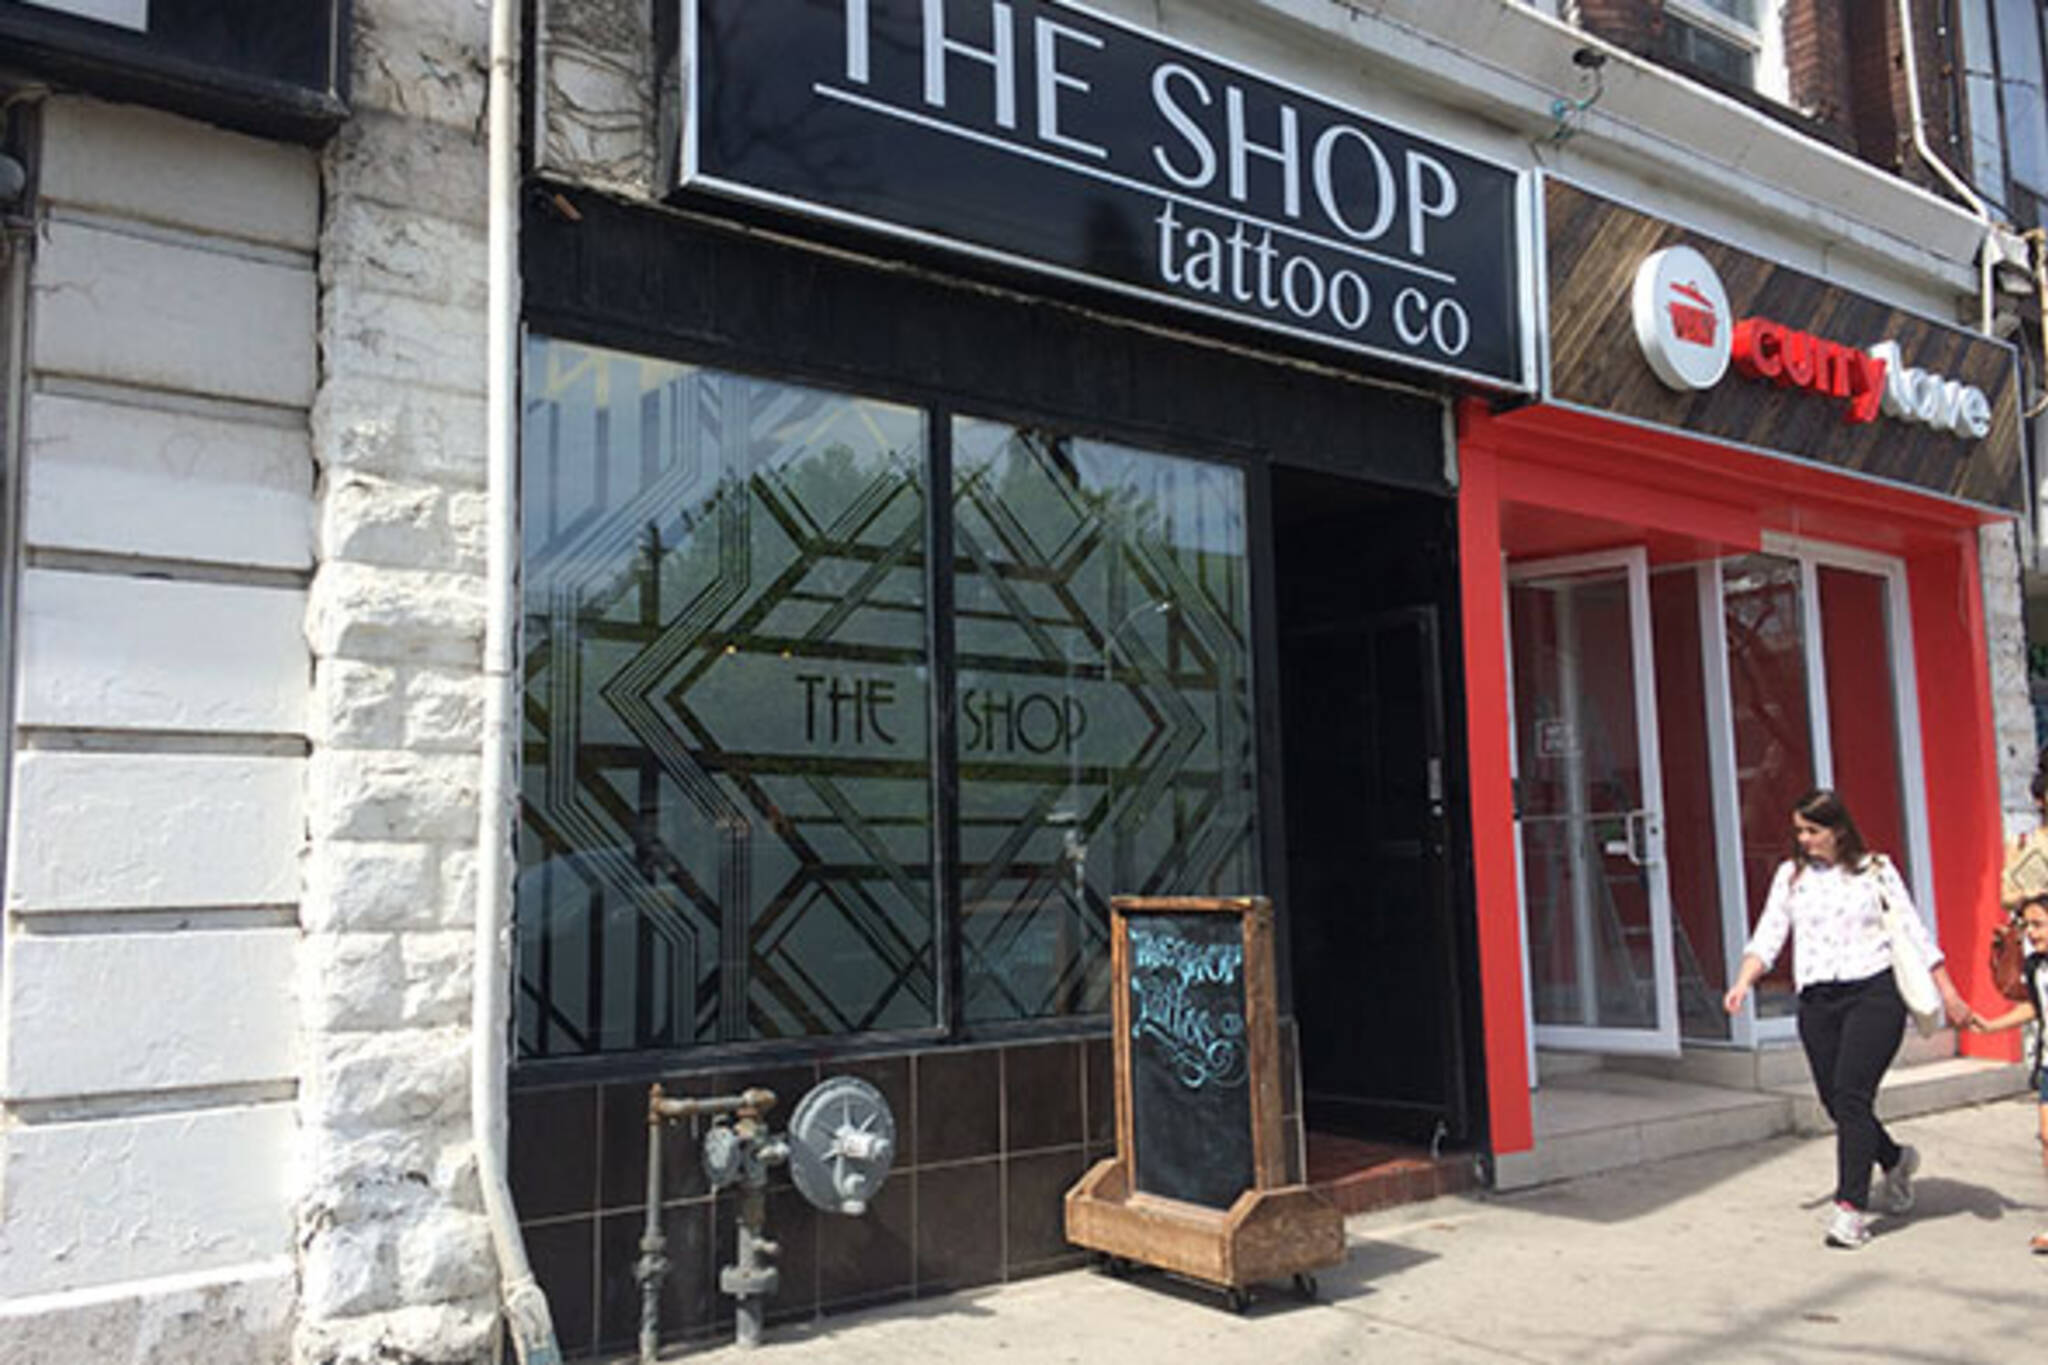 The Shop Tattoo